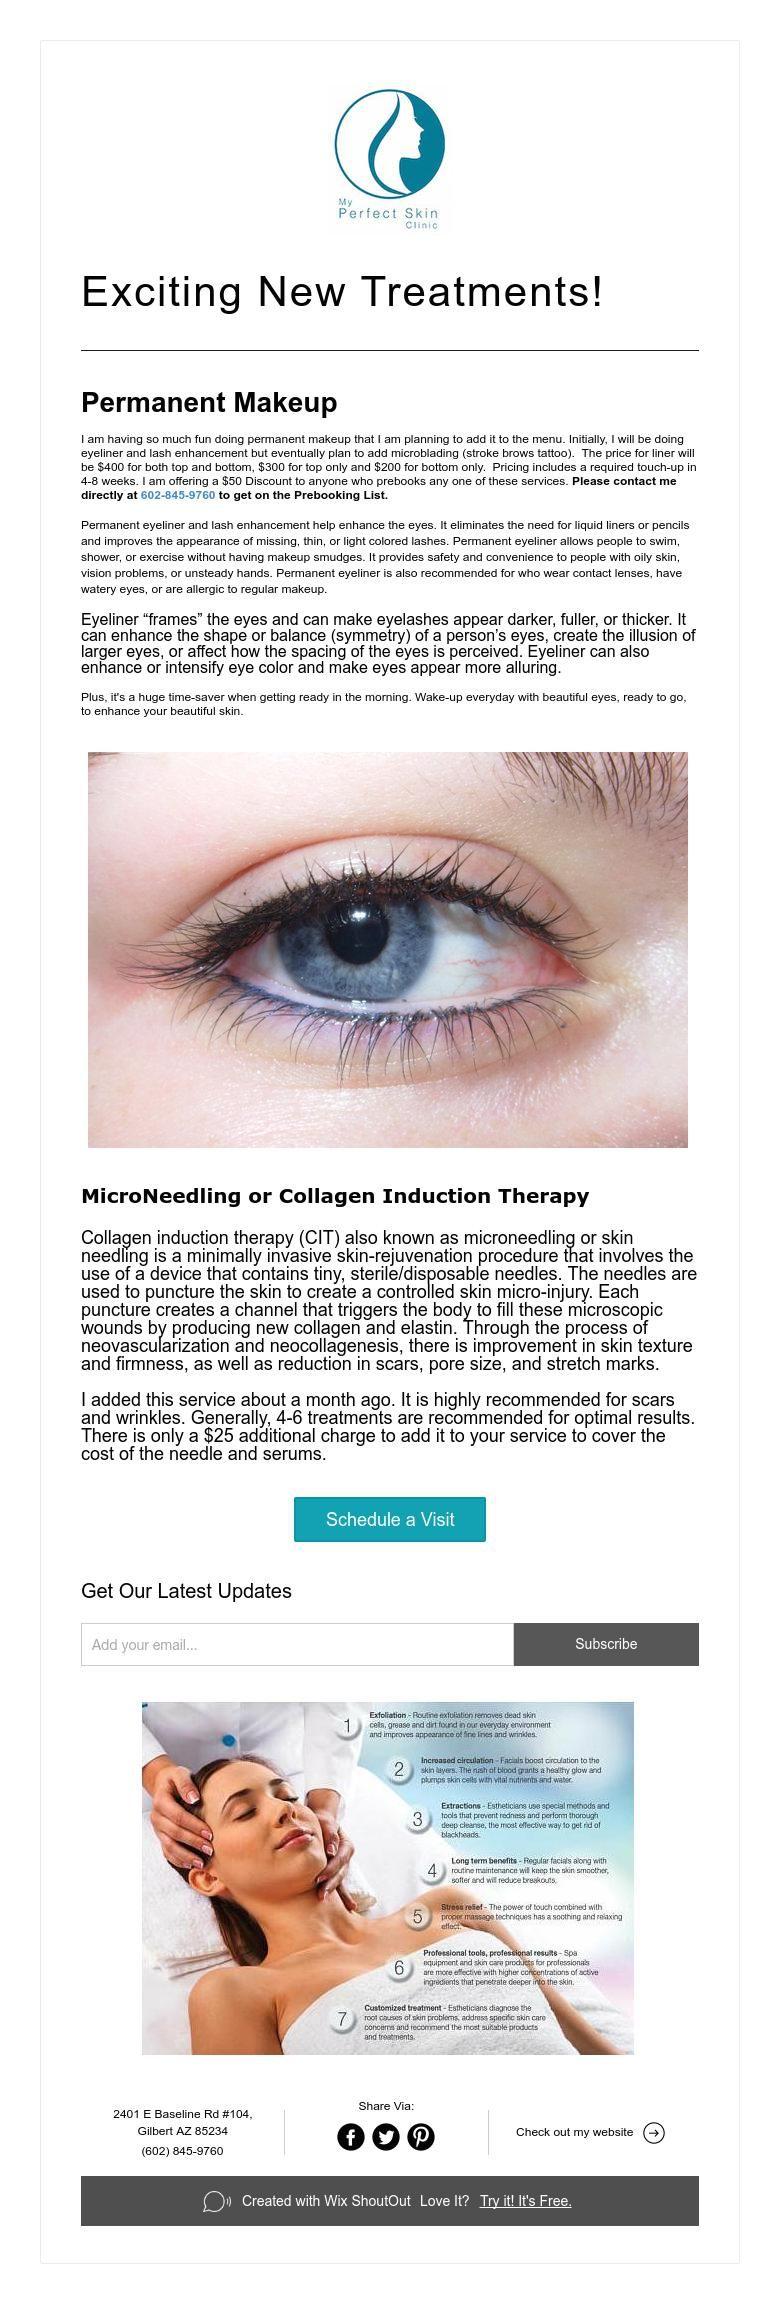 Exciting new treatments permanent makeup permanent